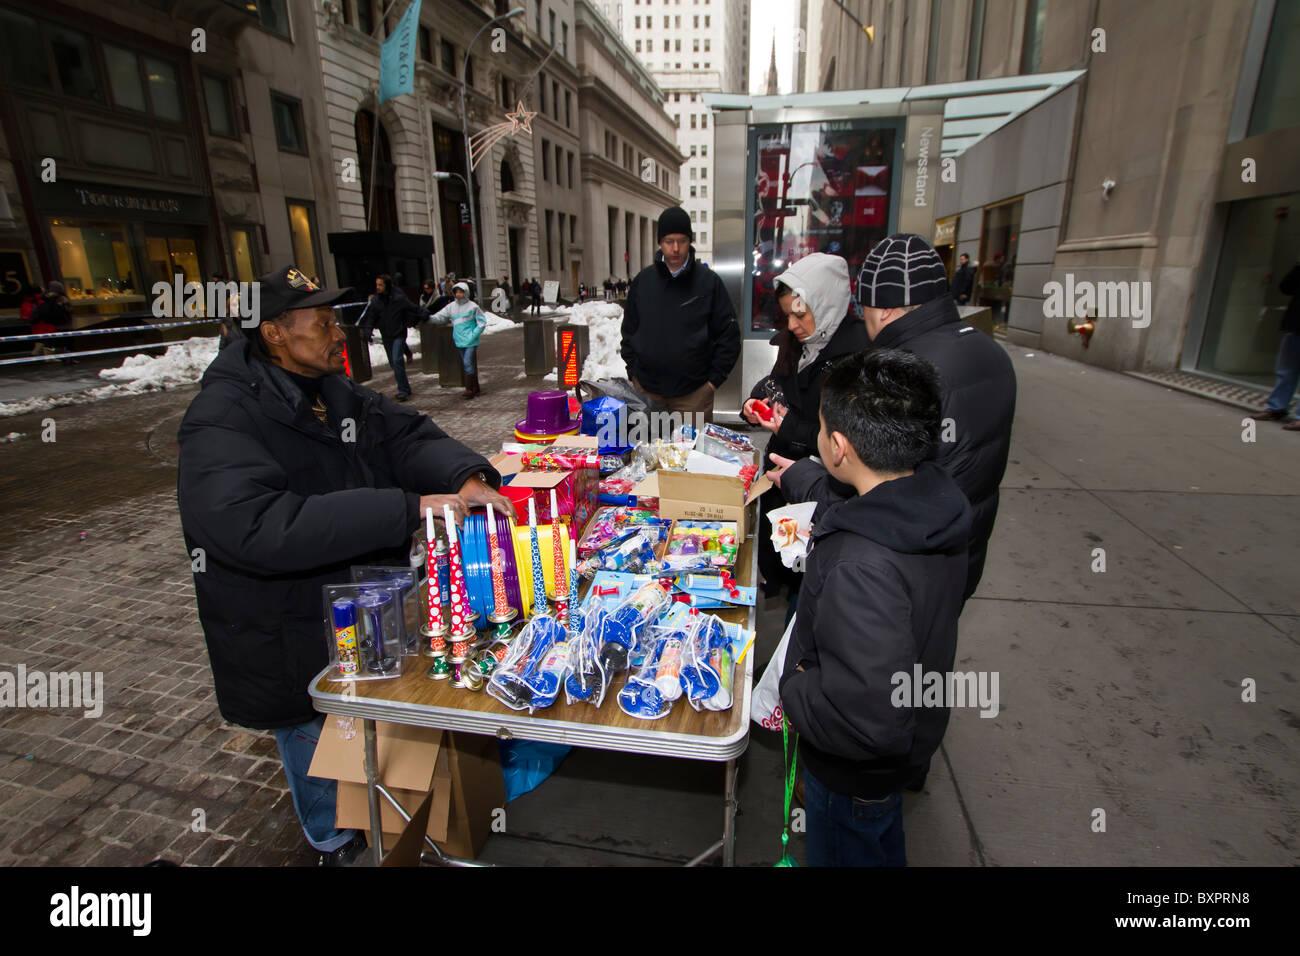 New York Street Vendor Sells Stock Photos & New York Street